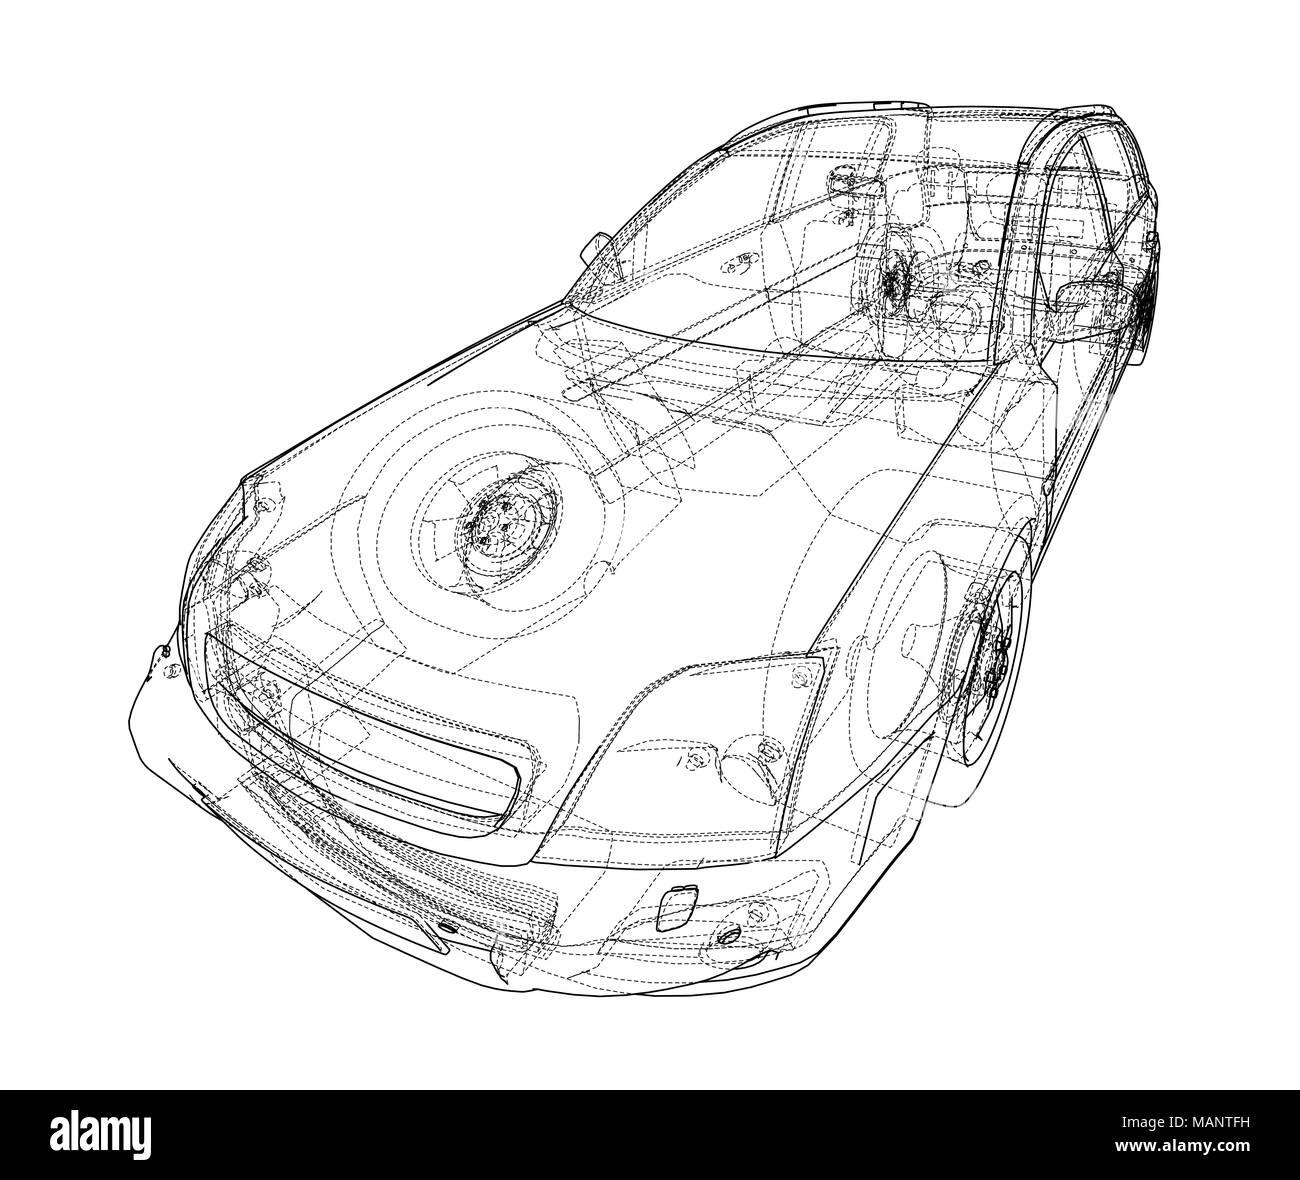 Concept car blueprint  3d illustration  Wire-frame style Stock Photo